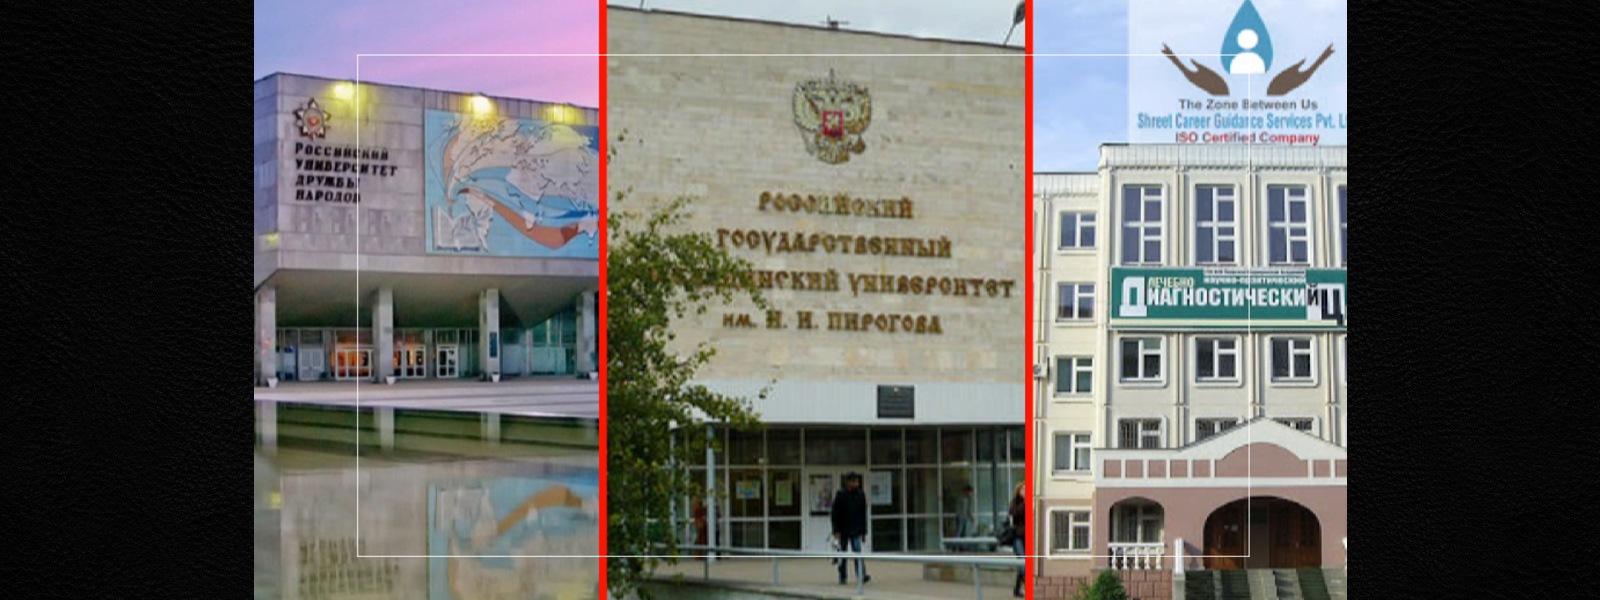 Sri Lanka Medical Council delists three Russian Universities following review